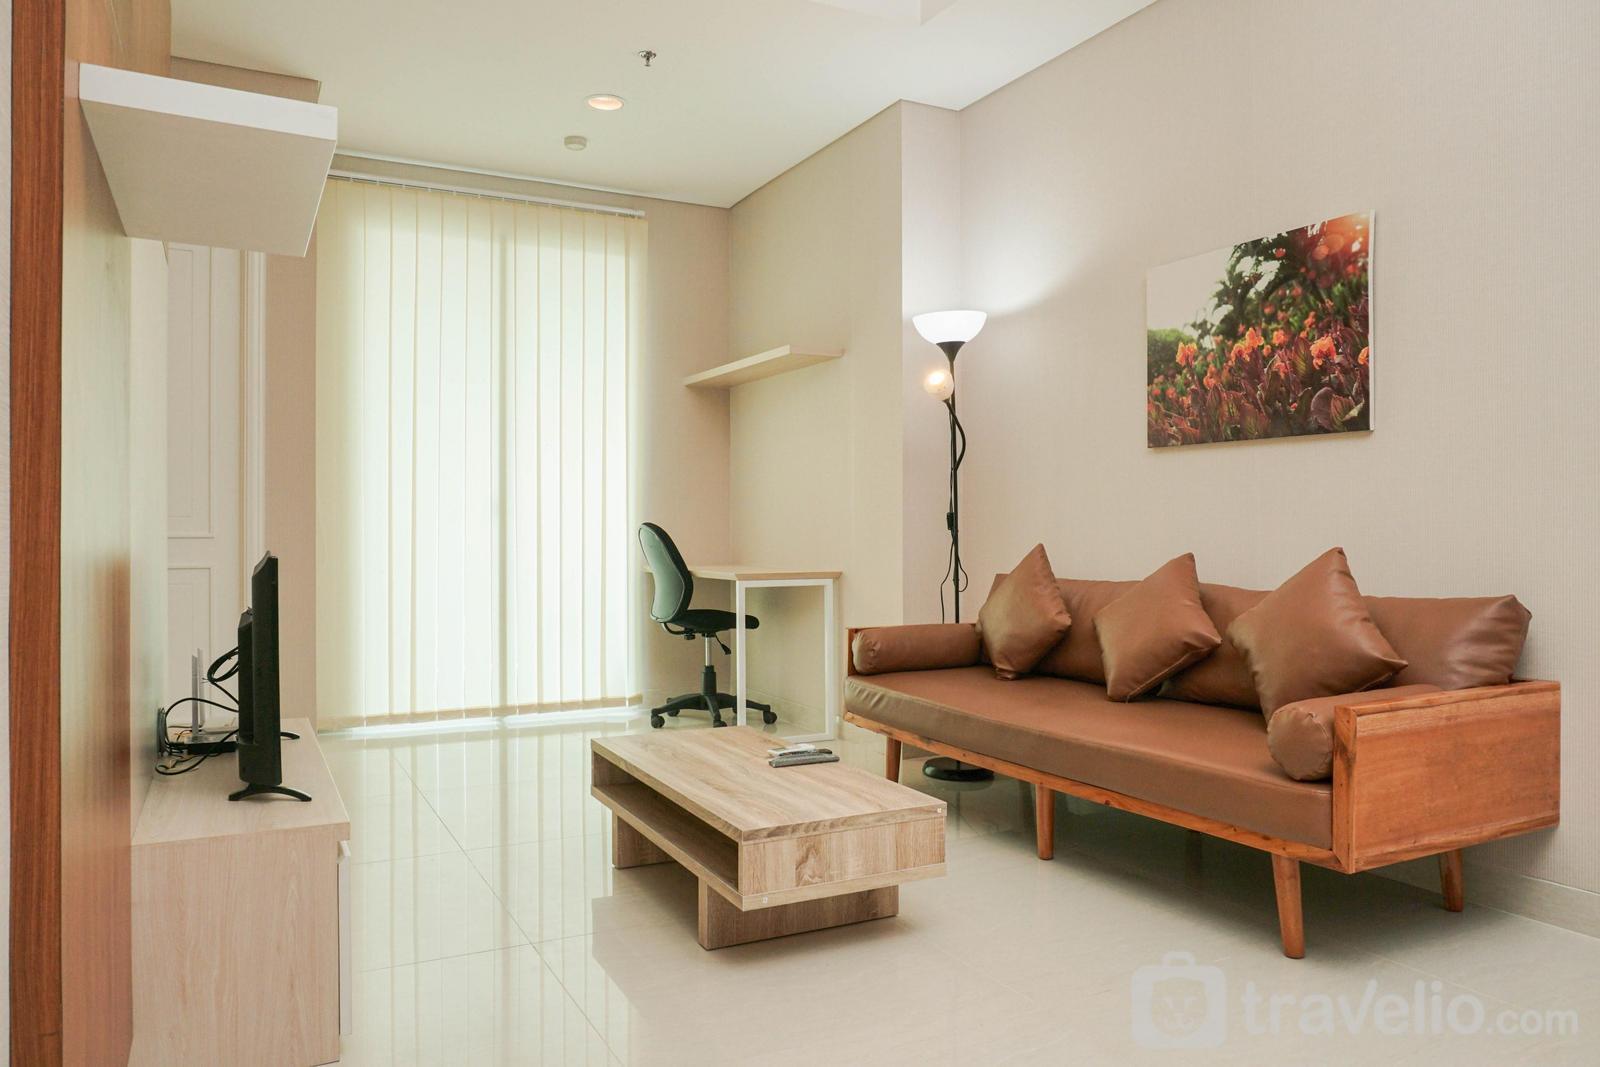 Apartemen Grand Madison - Fabulous and Strategic 2BR Grand Madison Apartment By Travelio